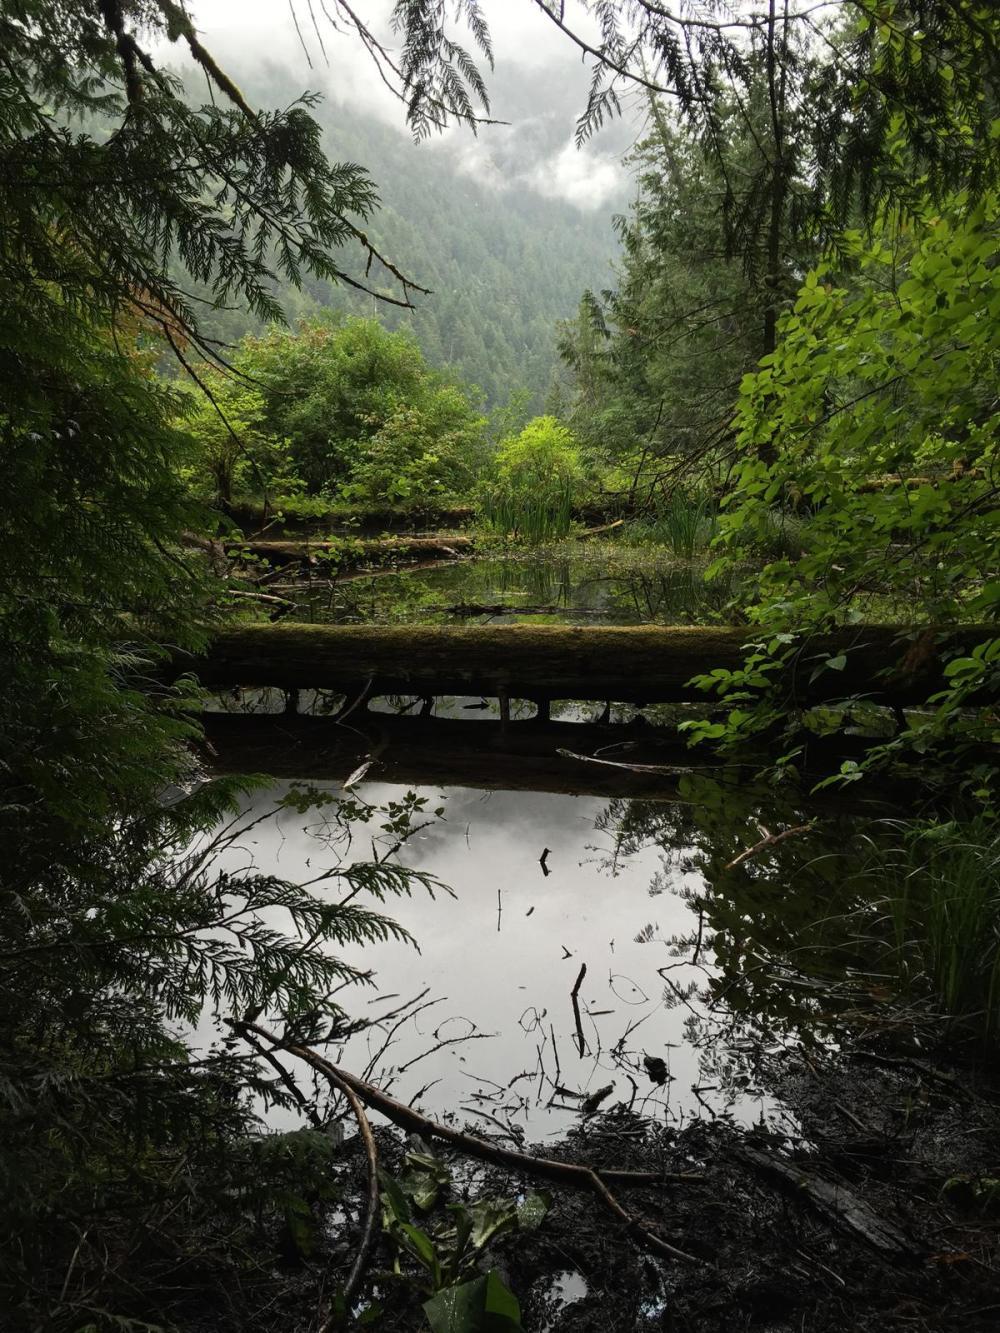 Splodz Blogz | Favourite Photos | Canada - Cathedral Grove, MacMillan Provincial Park